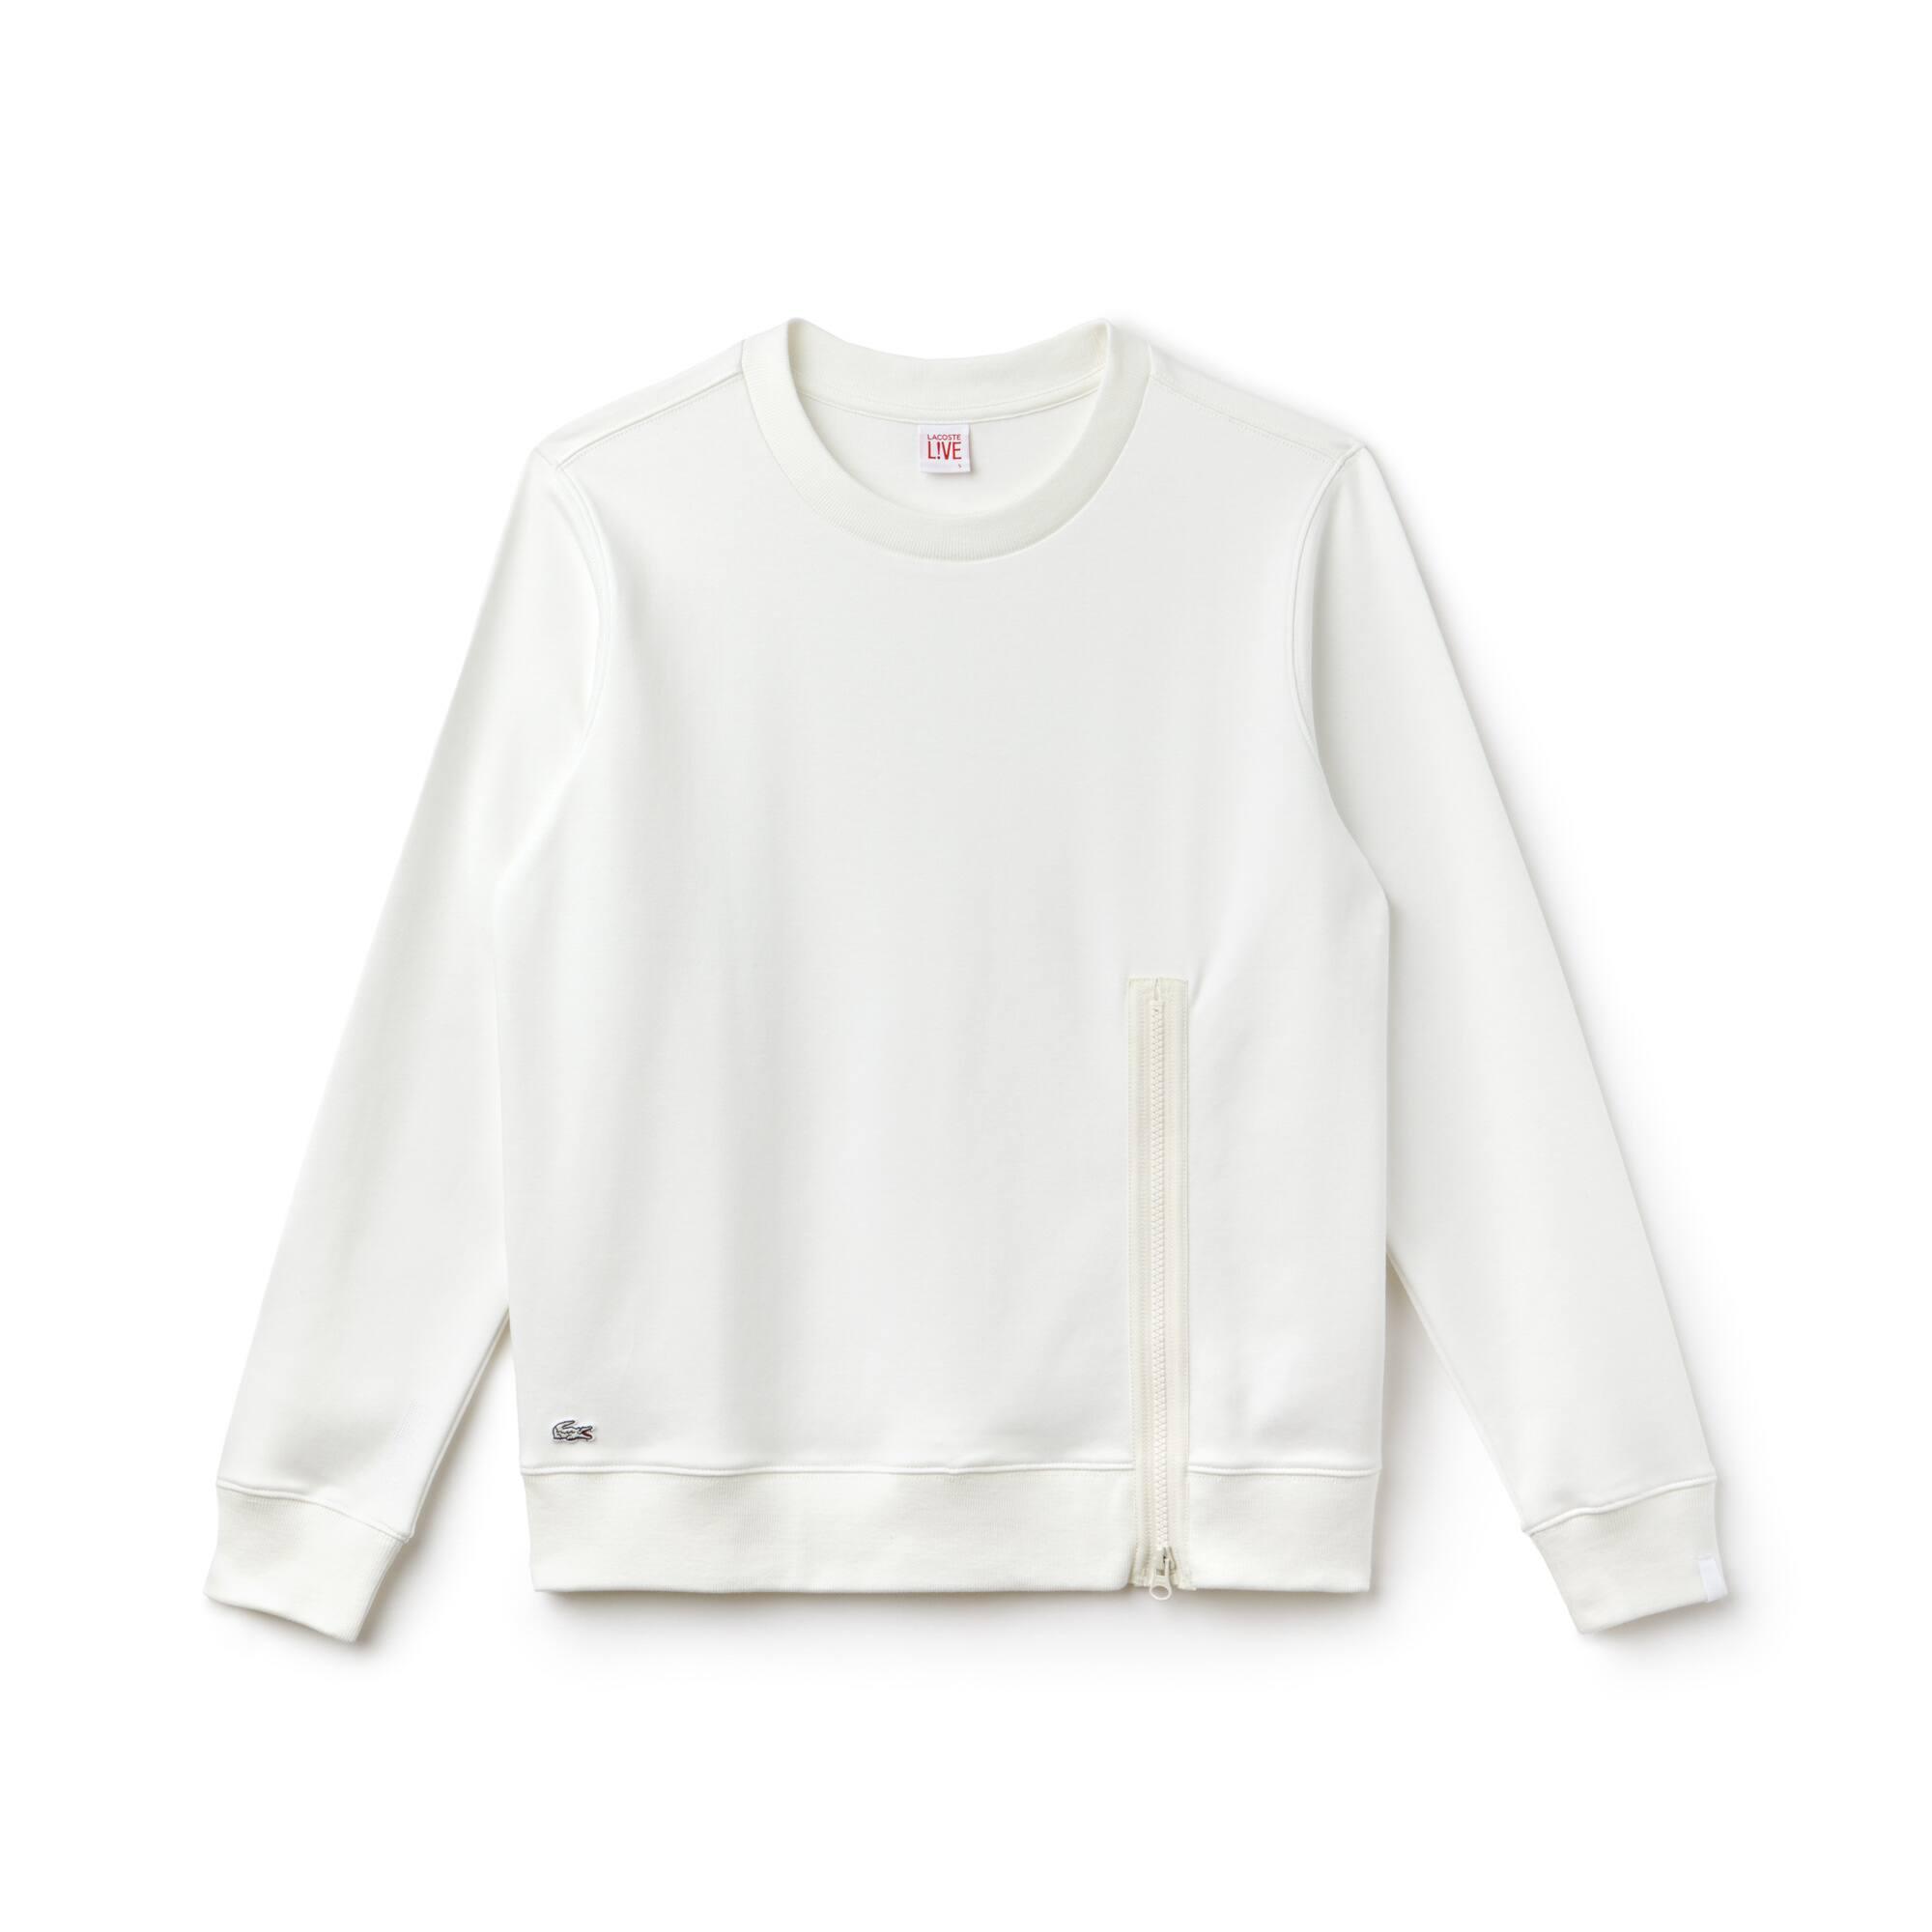 Sweatshirt decote redondo Lacoste LIVE em interlock com fecho de correr